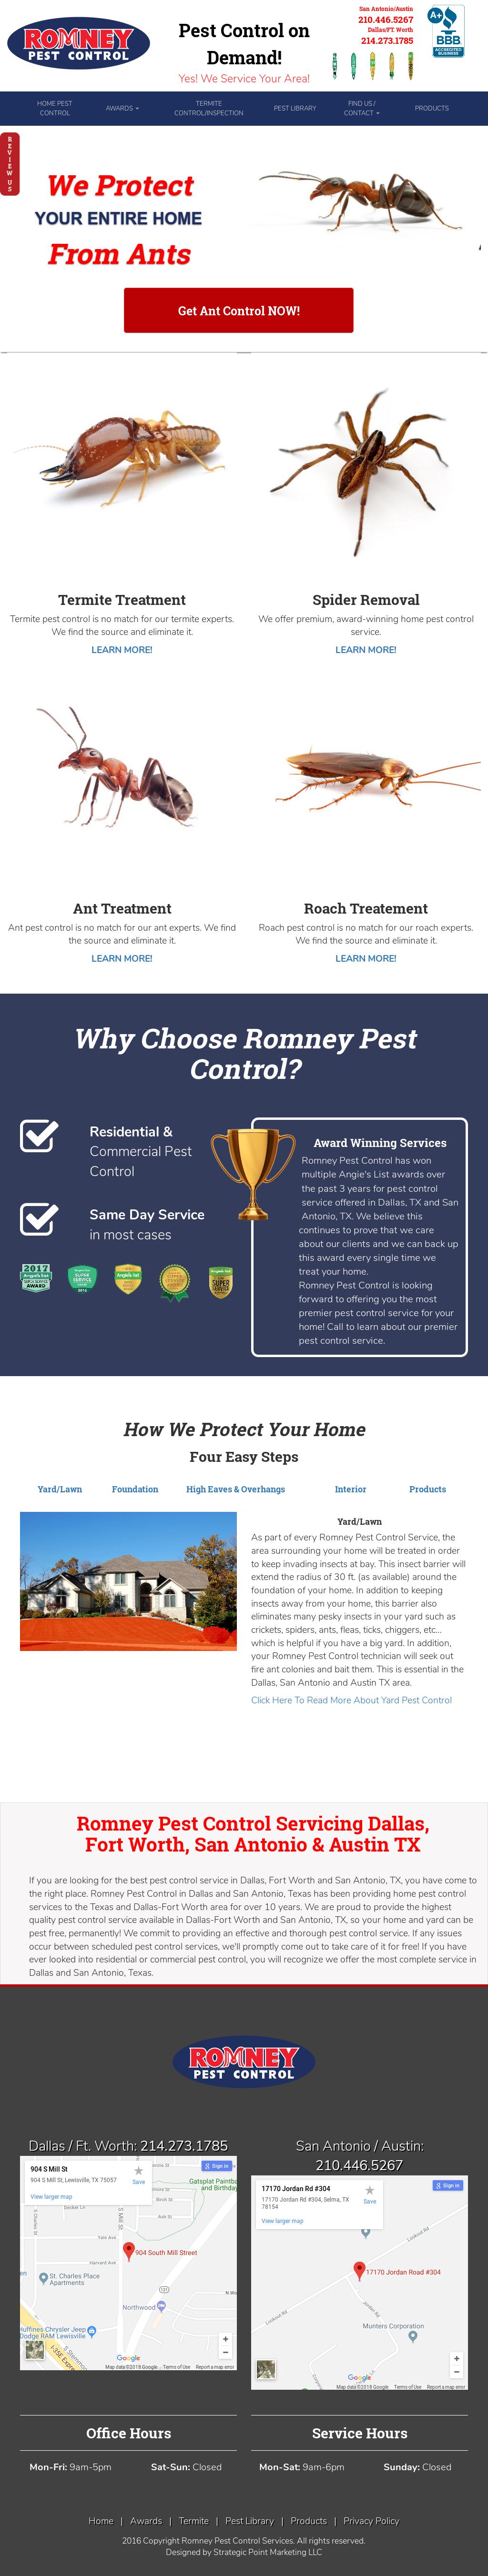 Romney Pest Control S Website Screenshot On Mar 2018